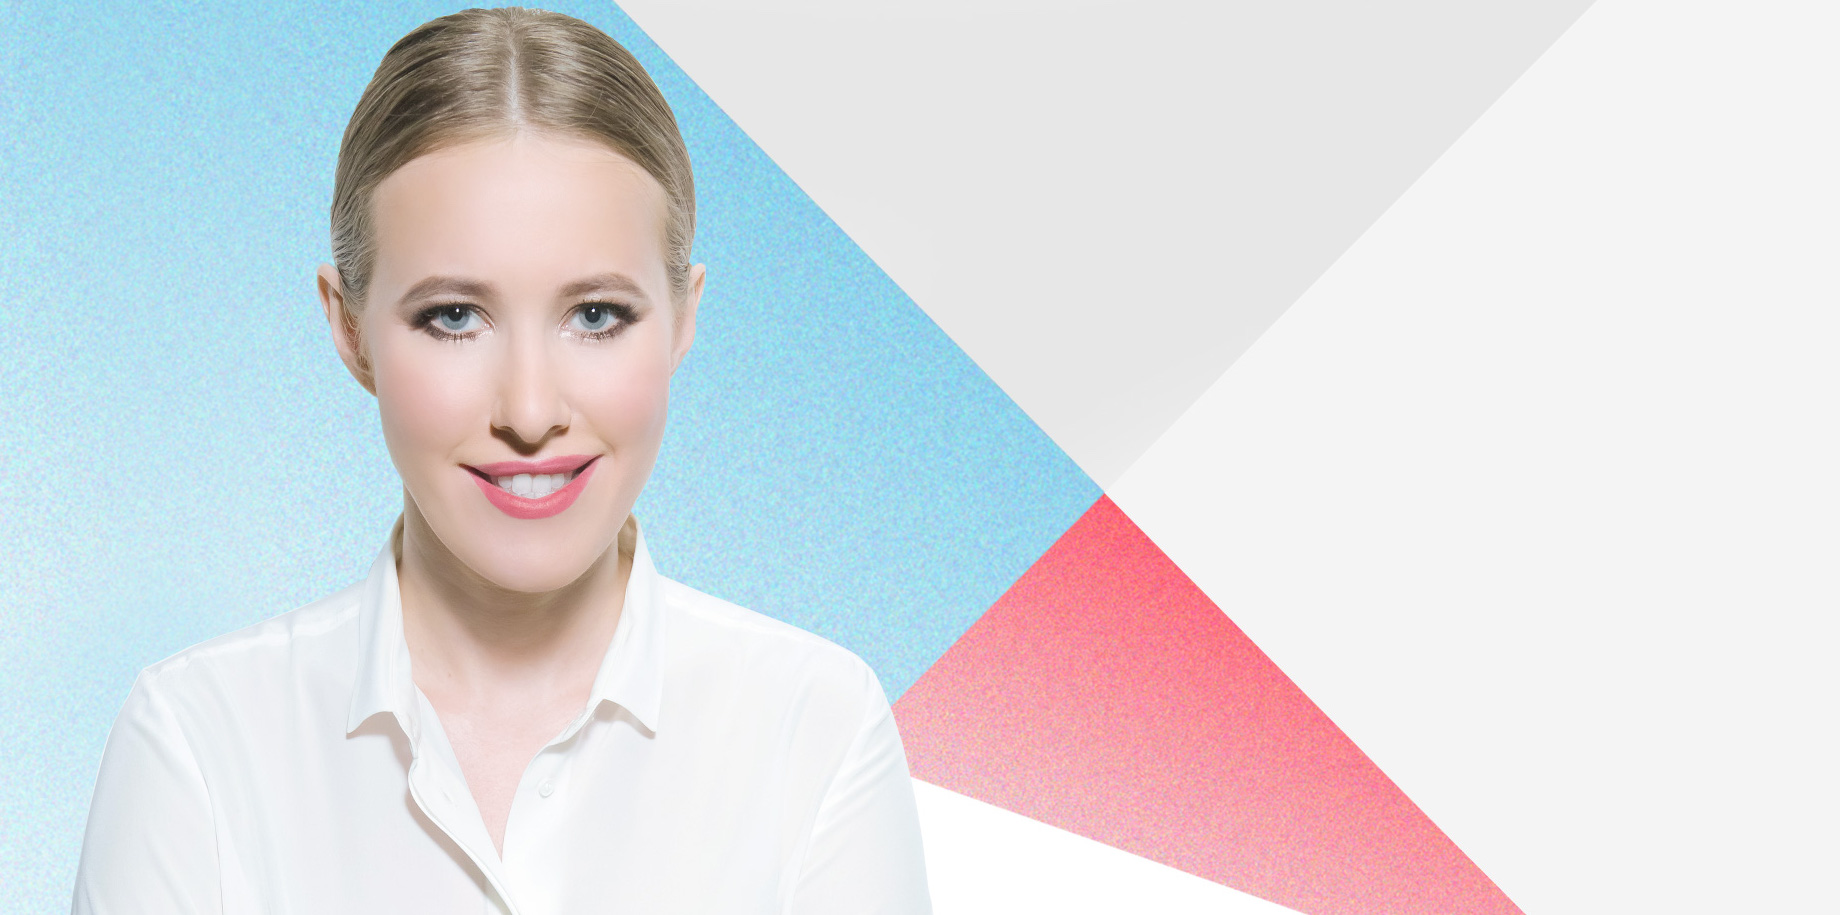 Официально: Ксения Собчак баллотируется на пост президента России